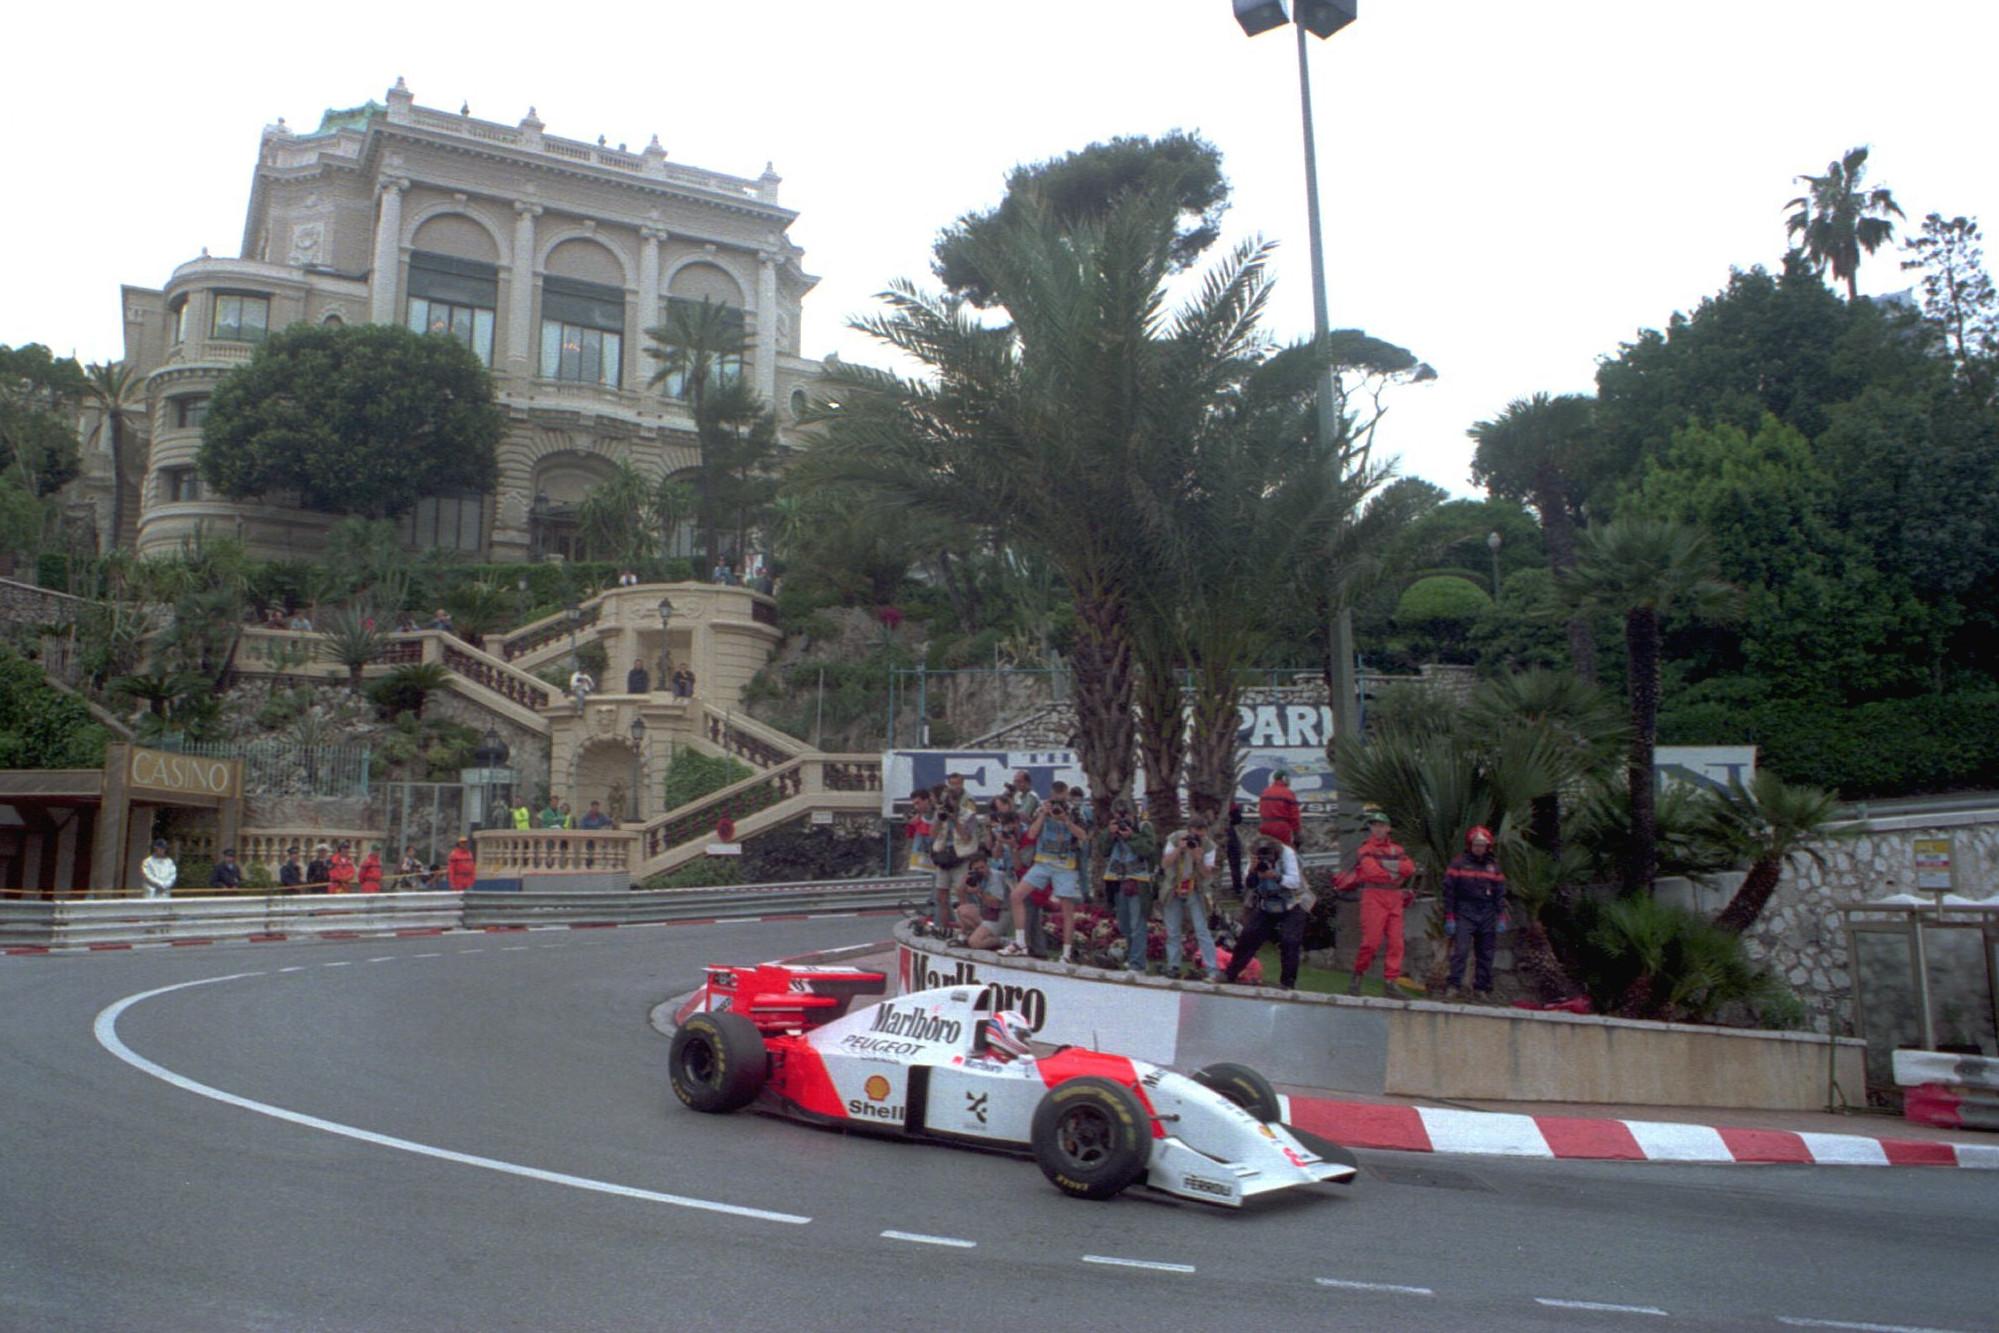 Martin Brundle, Monaco 1994